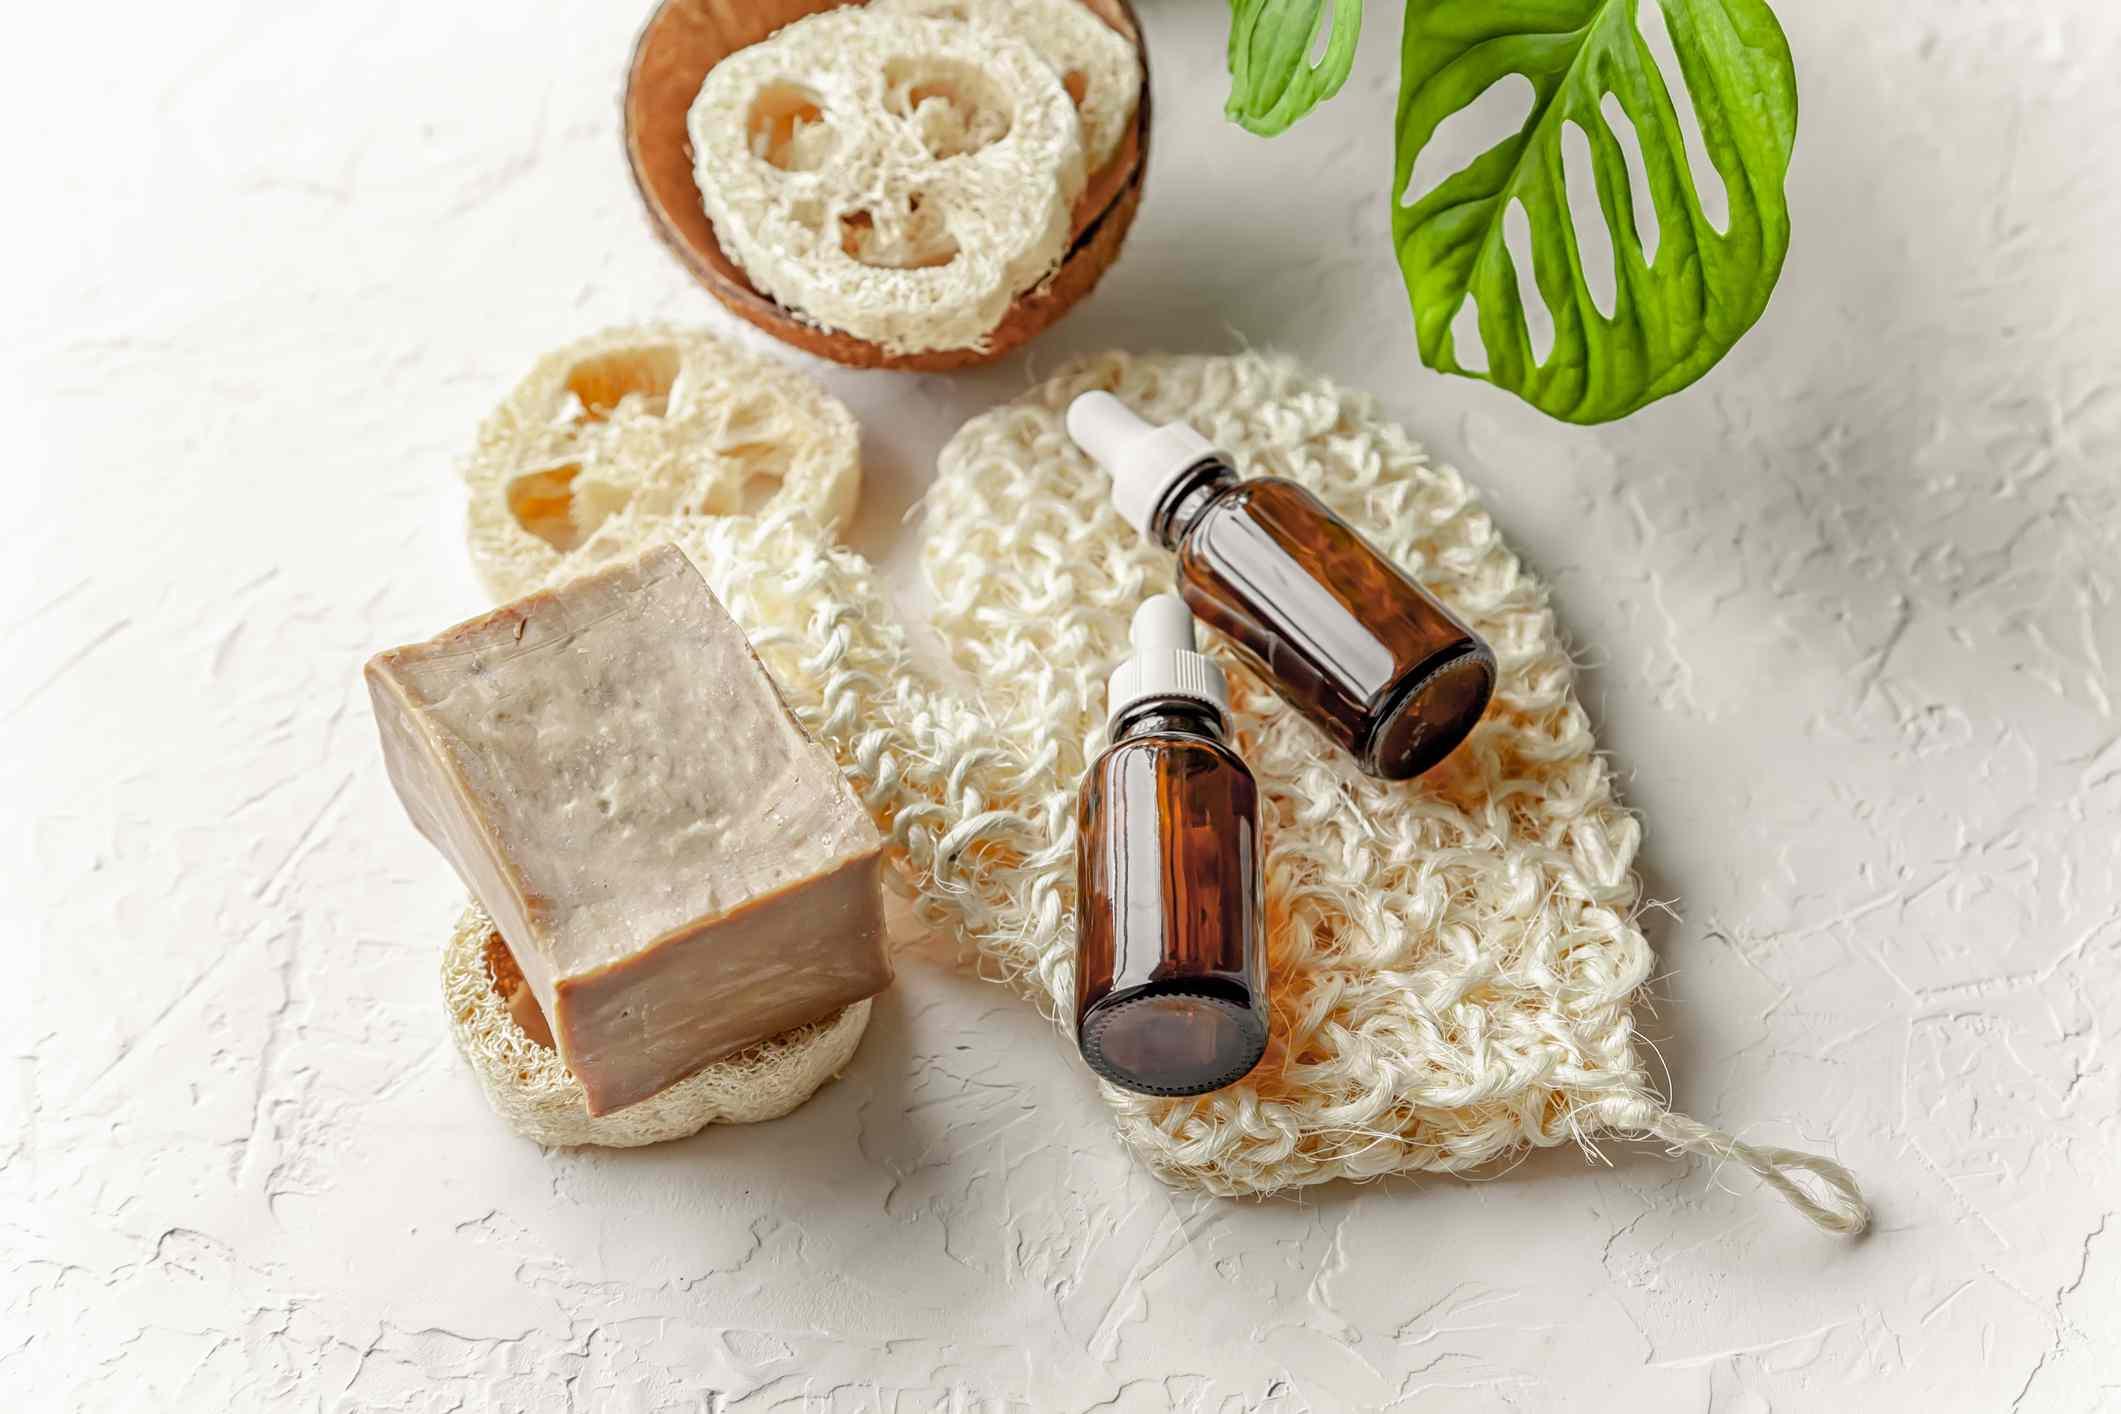 Homemade shampoo bar next to bottles of oils